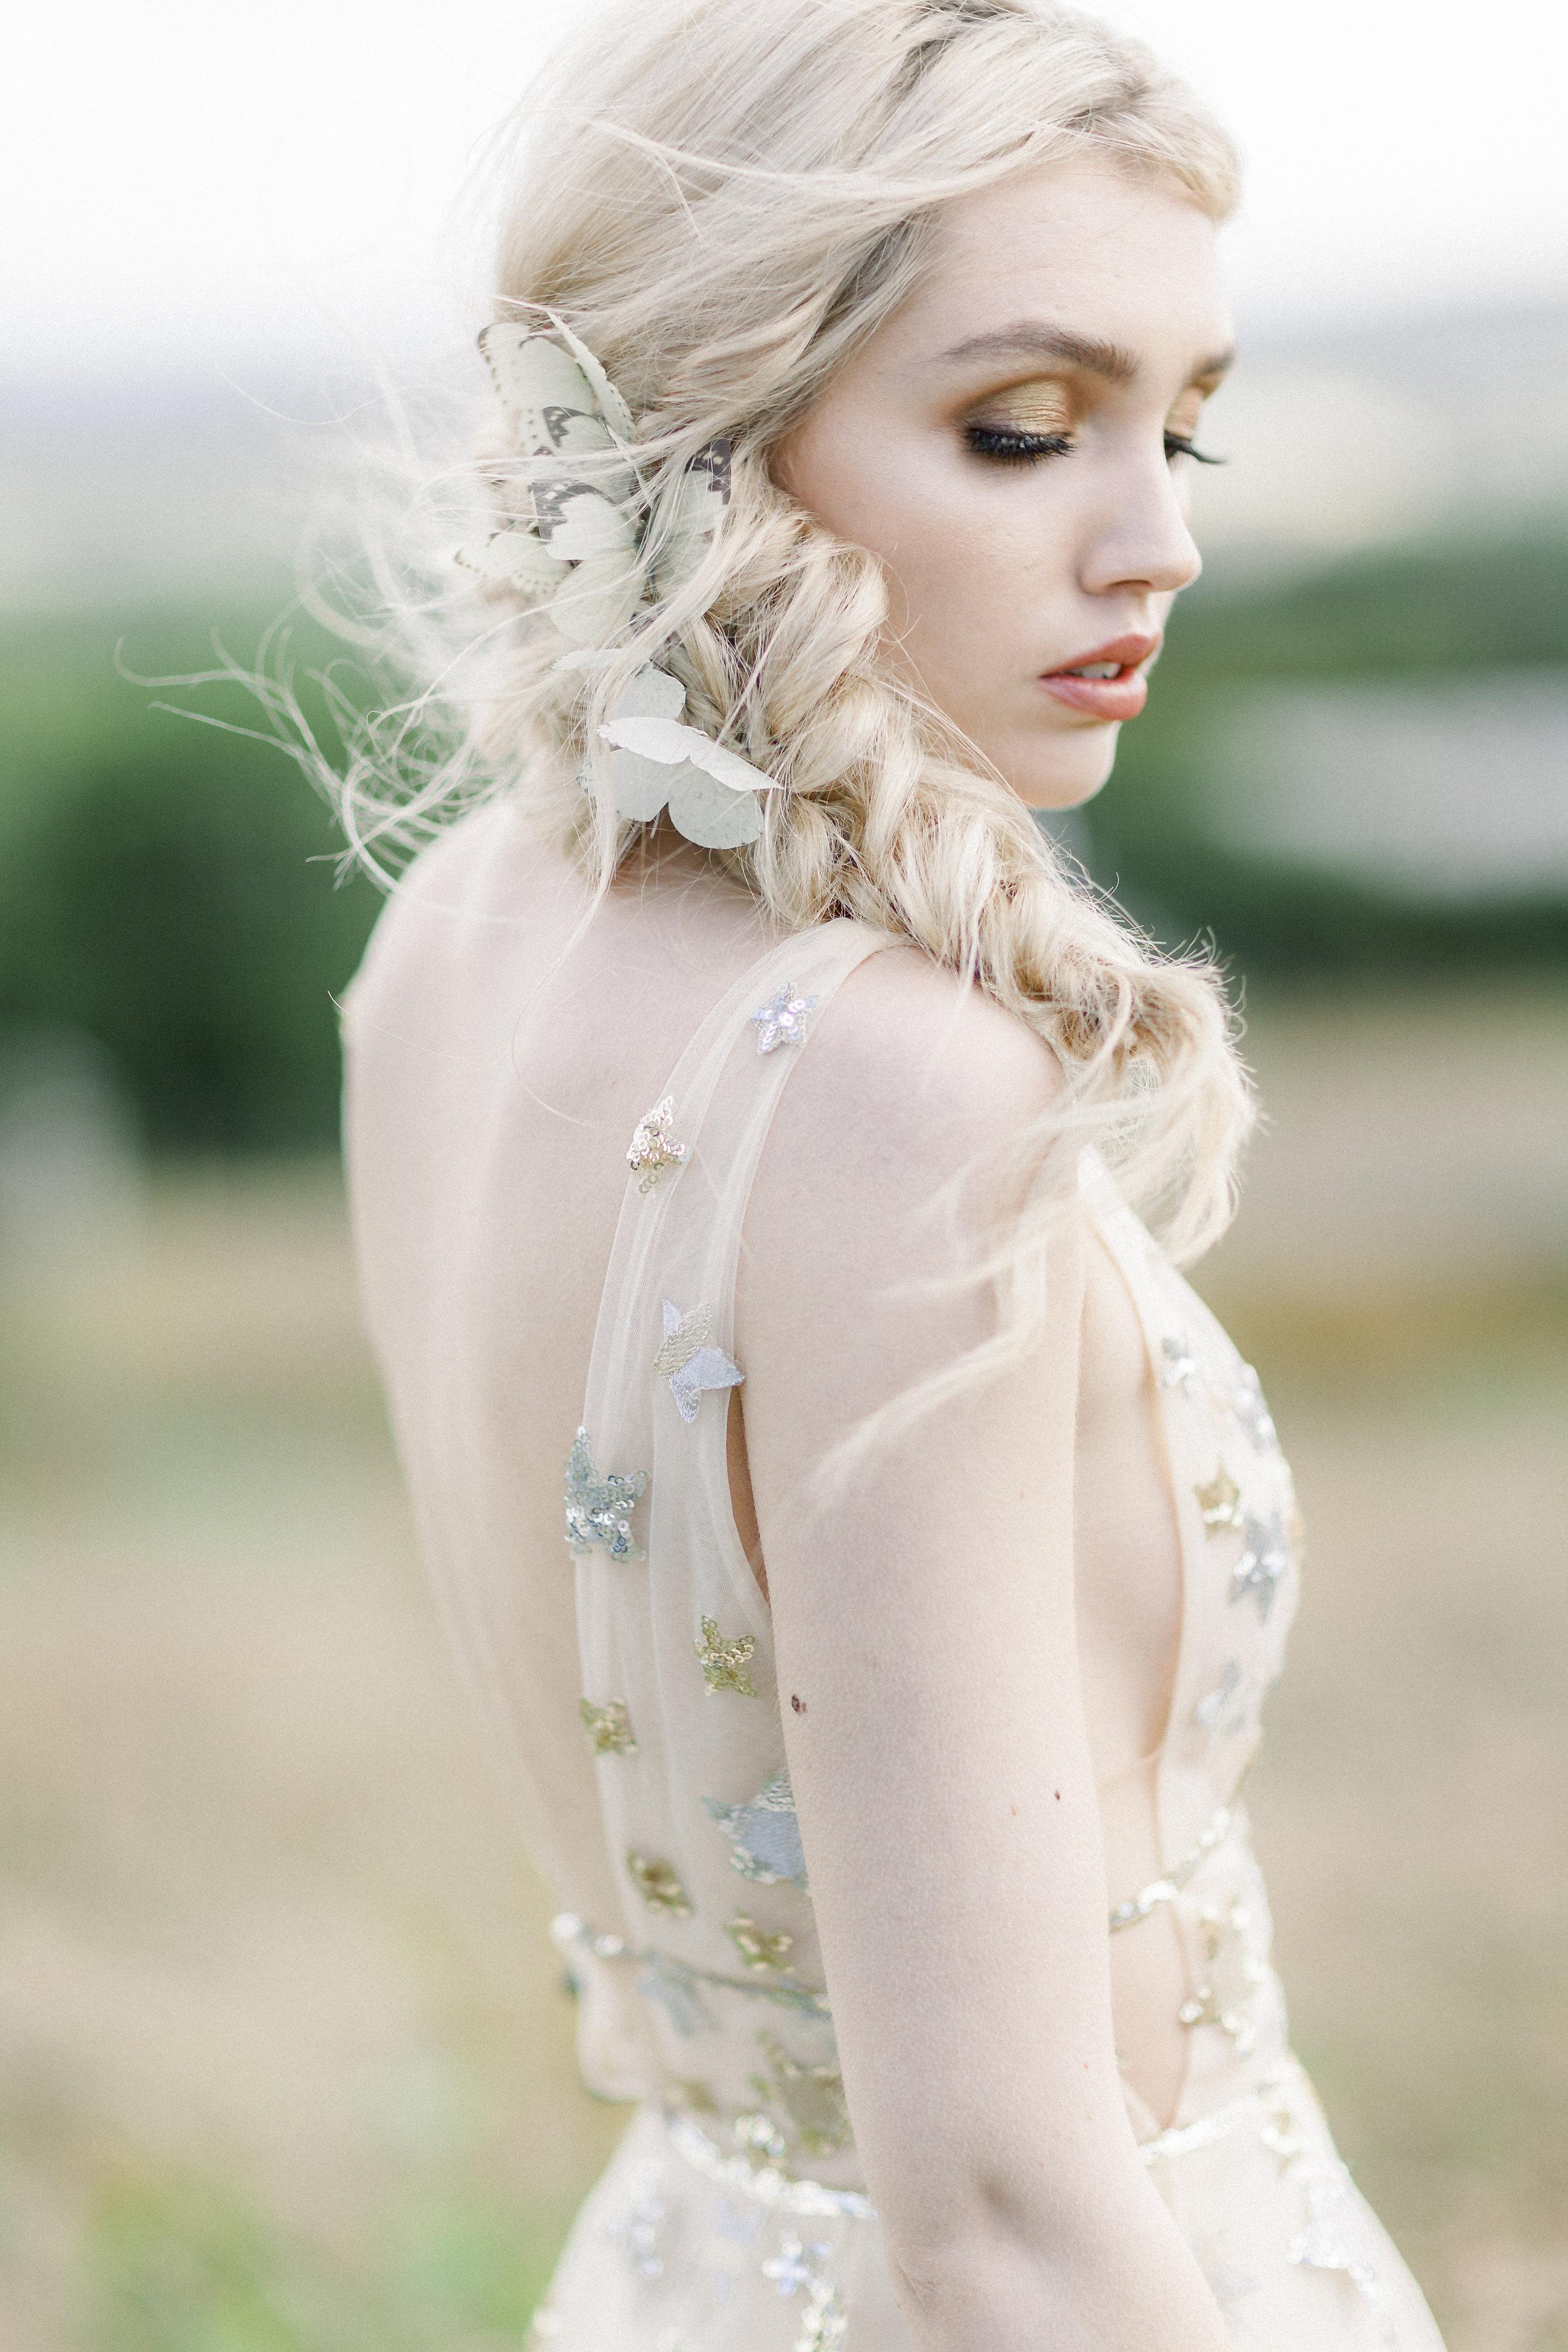 ethereal bohemian bride Boho Bride in Lace #bohobride #bohohair #braids #bohohairstyles  #hairoftheday #halfuphalfdown #bohostyle #weddinghair #bohemianbride #festivalhair #festivalbride #braid #bohowedding #cheshirebride #manchesterbride #weddinghairinspo  #cheshirewedding